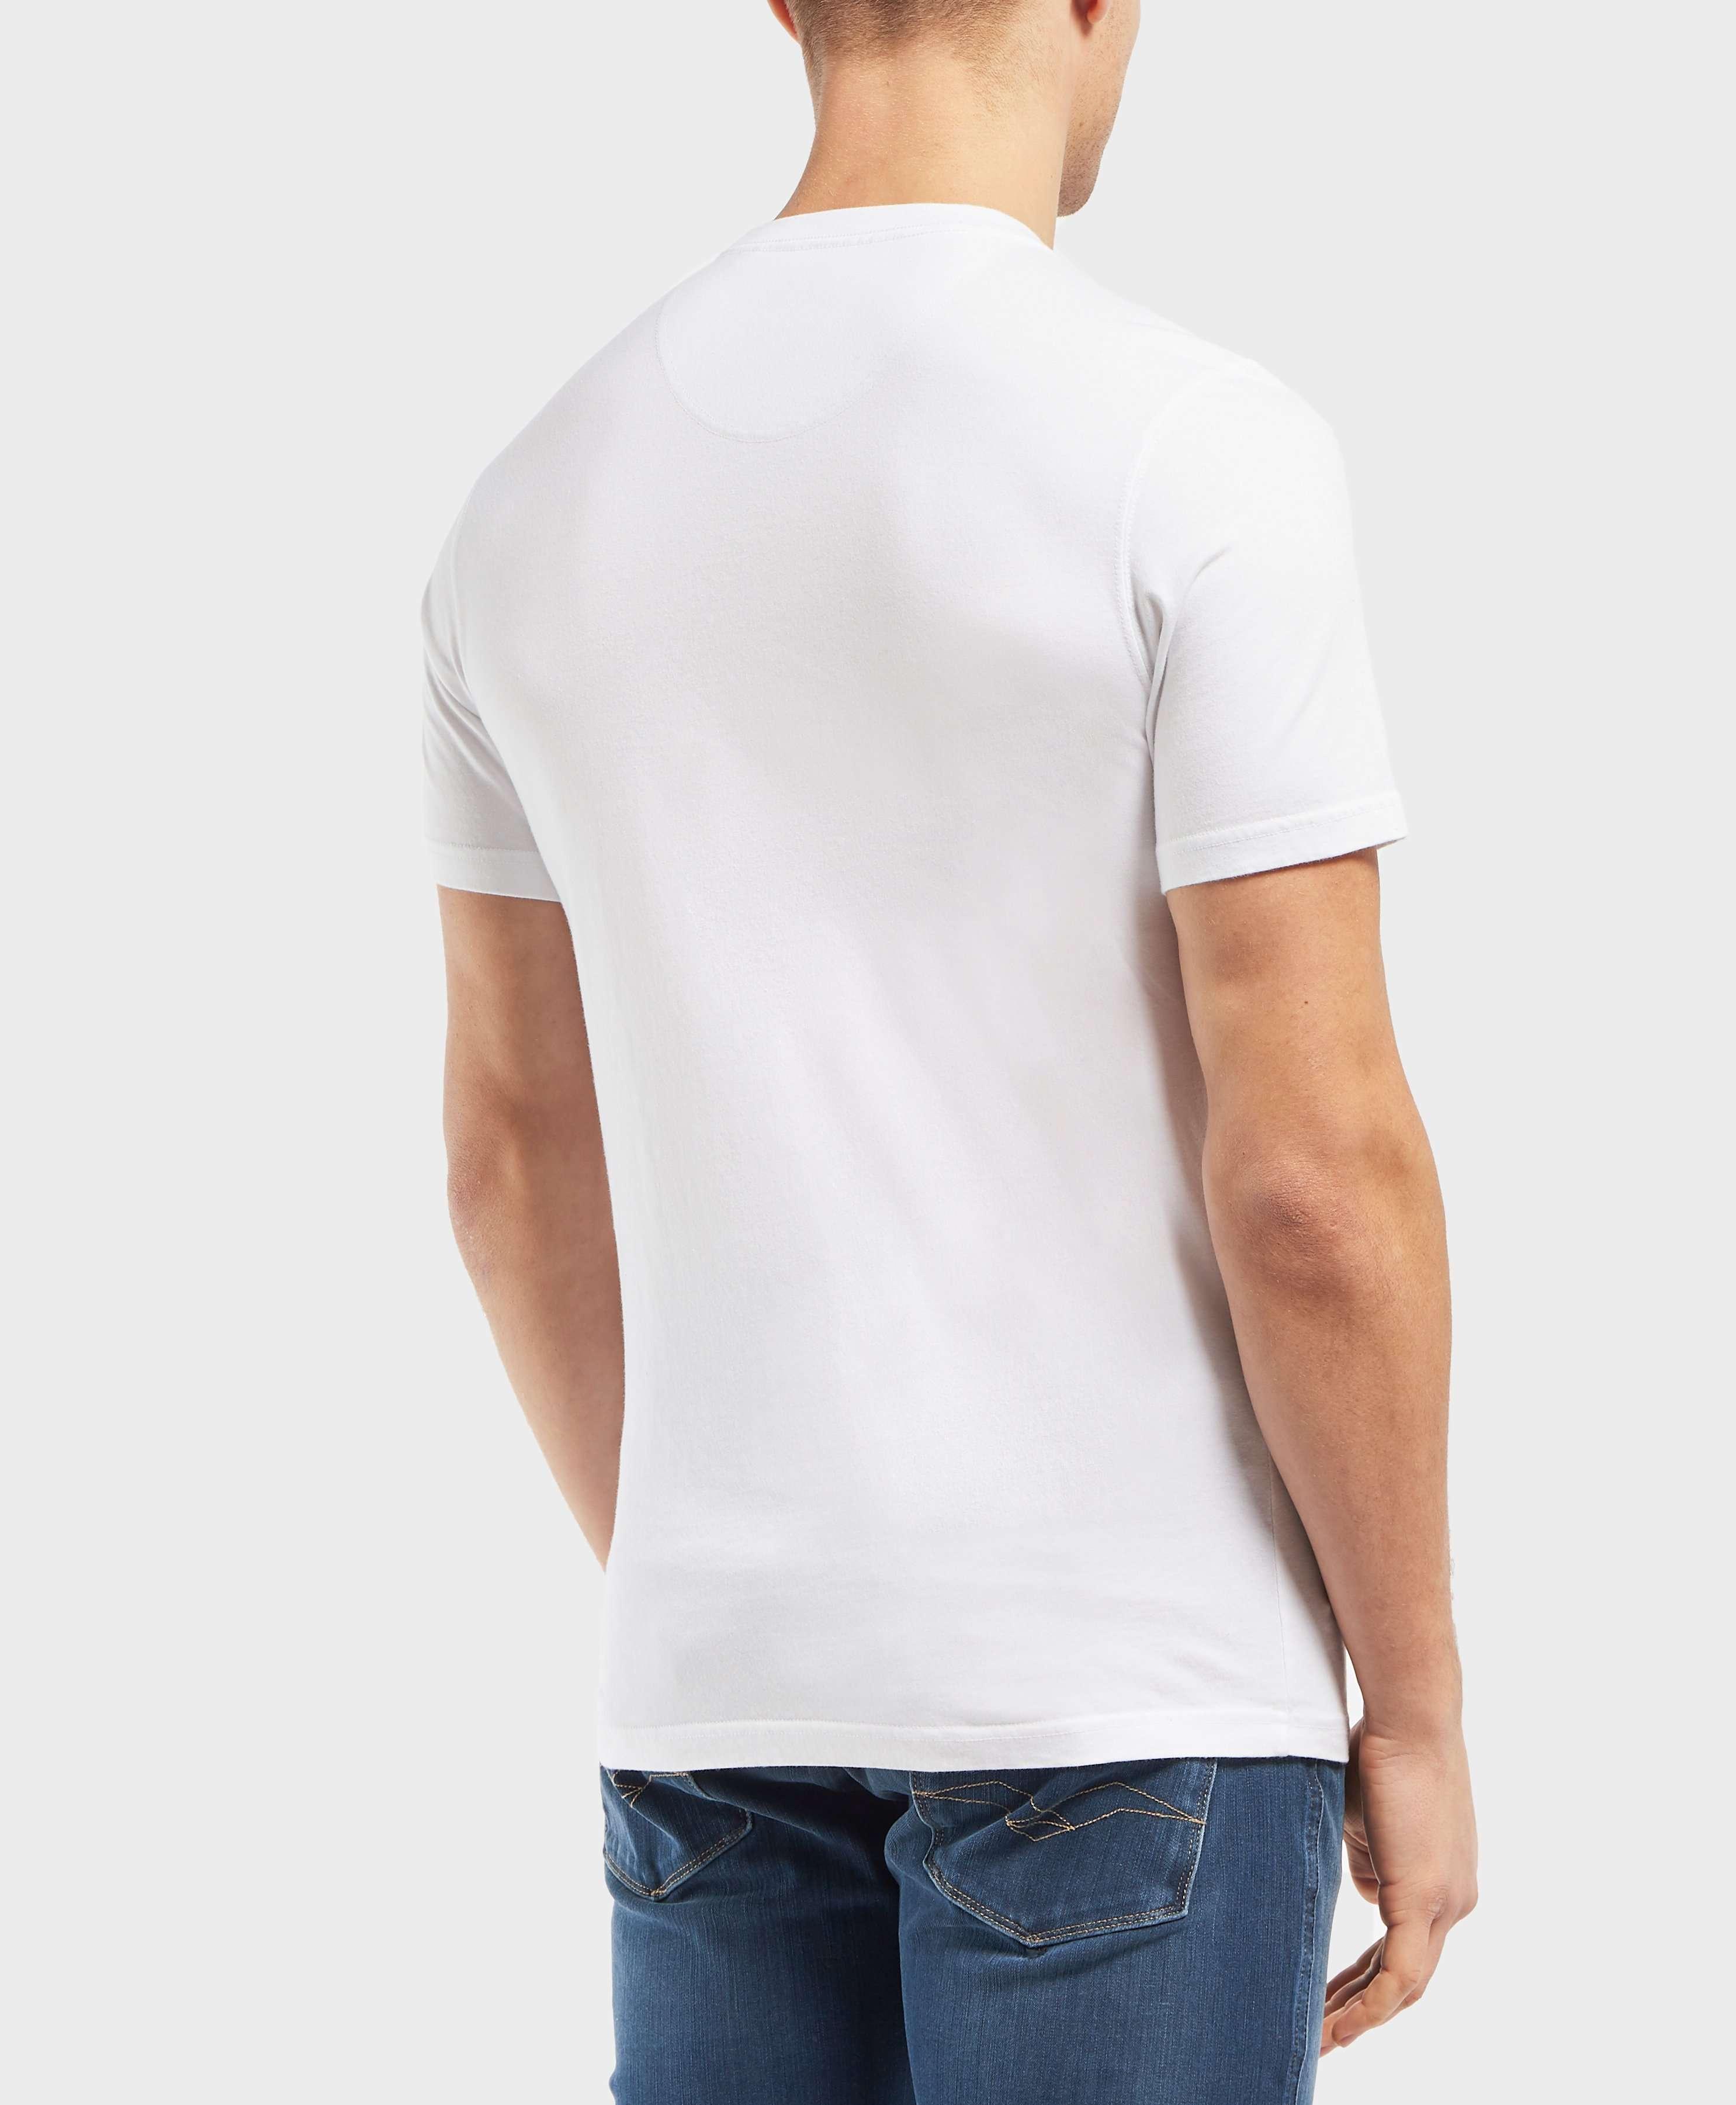 Barbour Beacon Multi Colour Short Sleeve T-Shirt